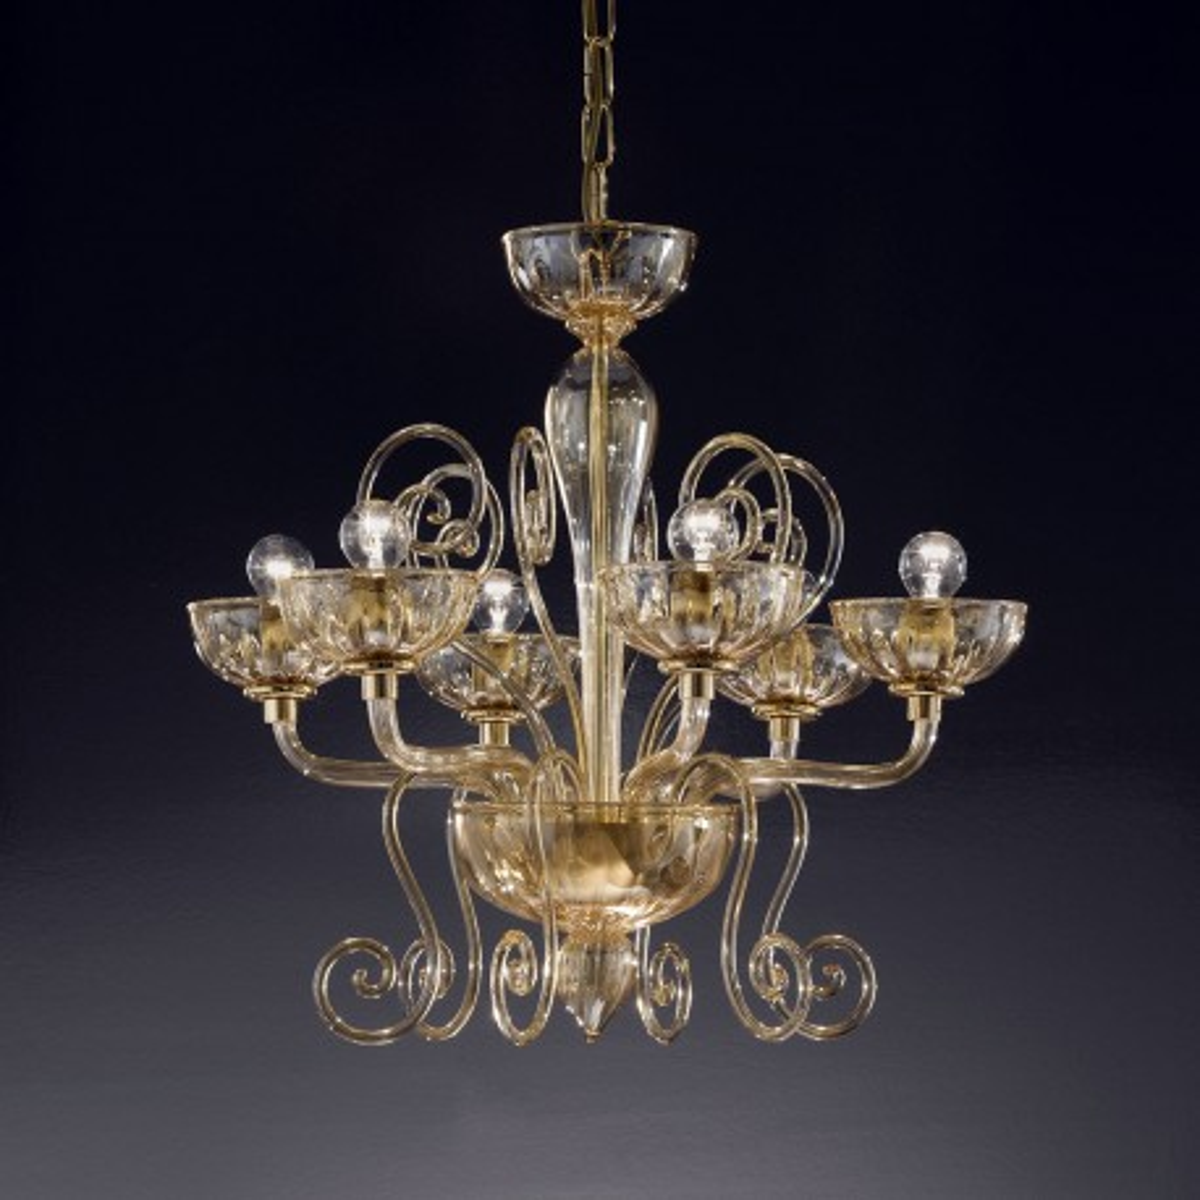 """Bassanio"" lustre en cristal de Murano - 6 lumières - ambre"